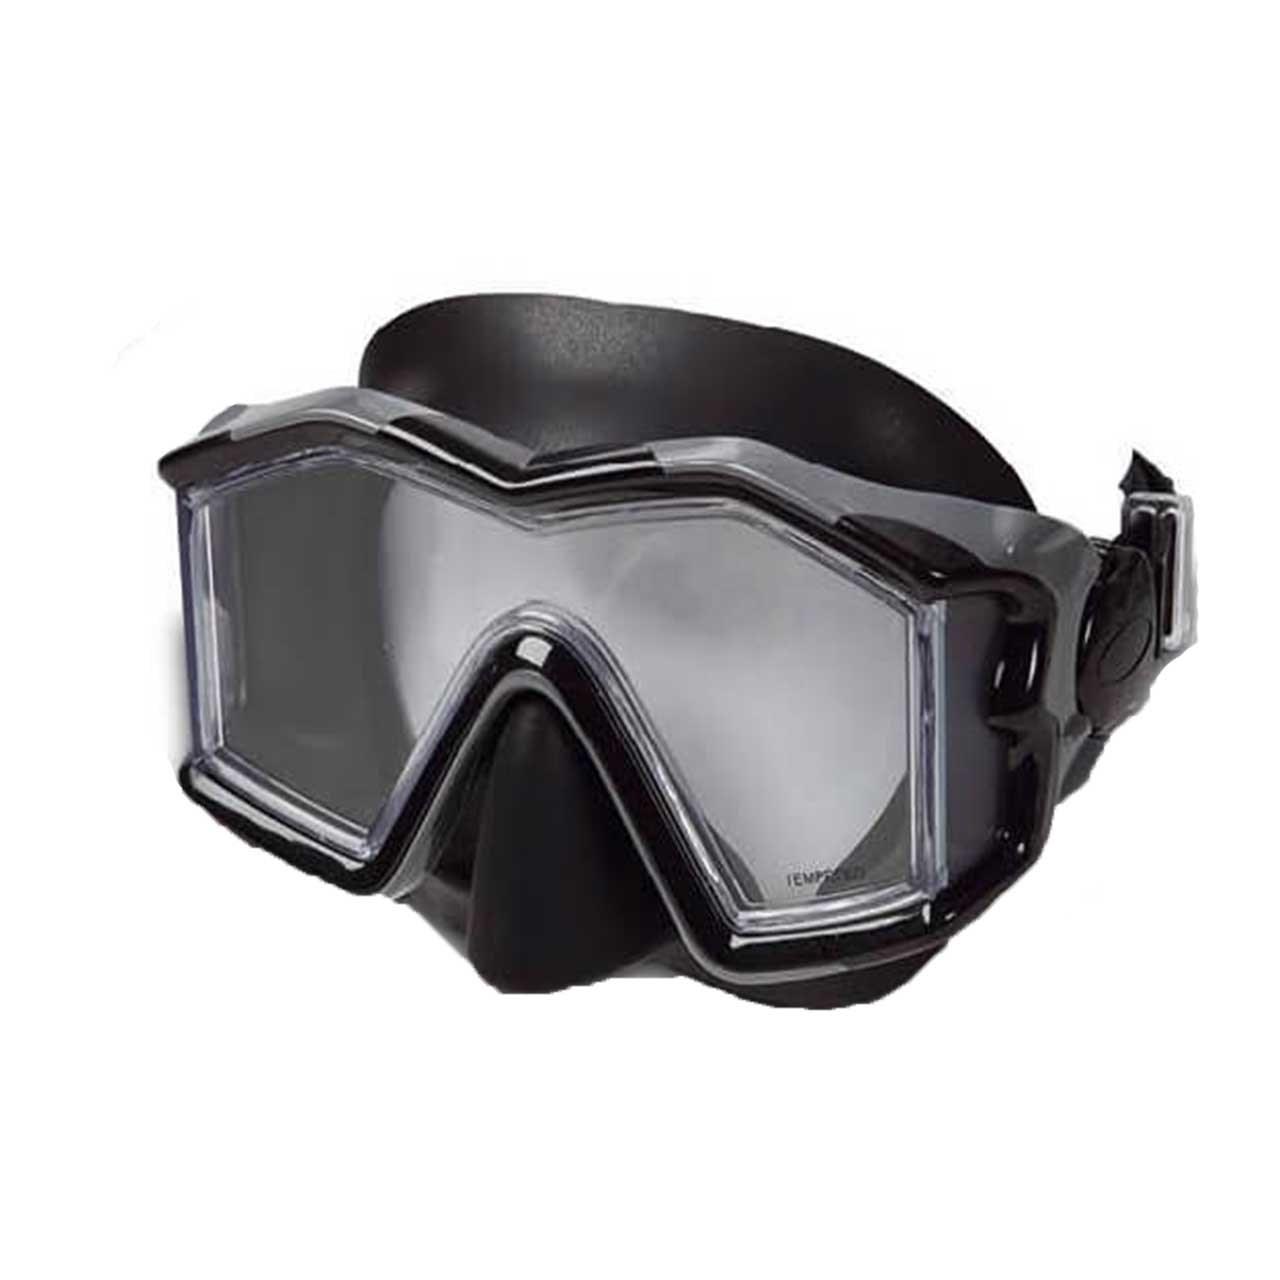 ماسک شنا اینتکس مدل 55982